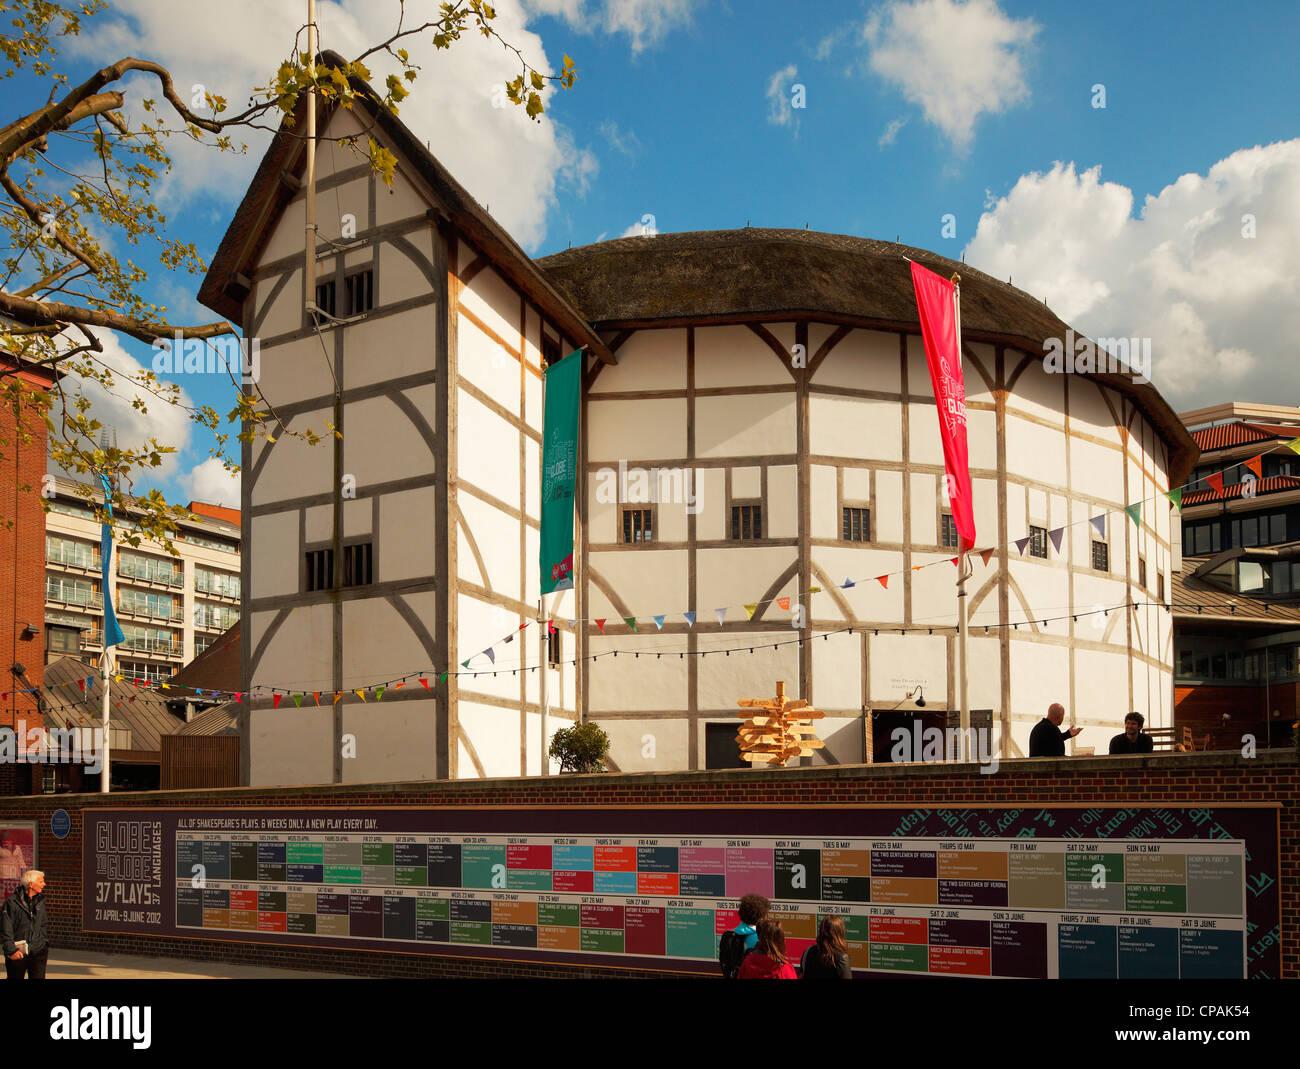 Globe Theatre, London. - Stock Image